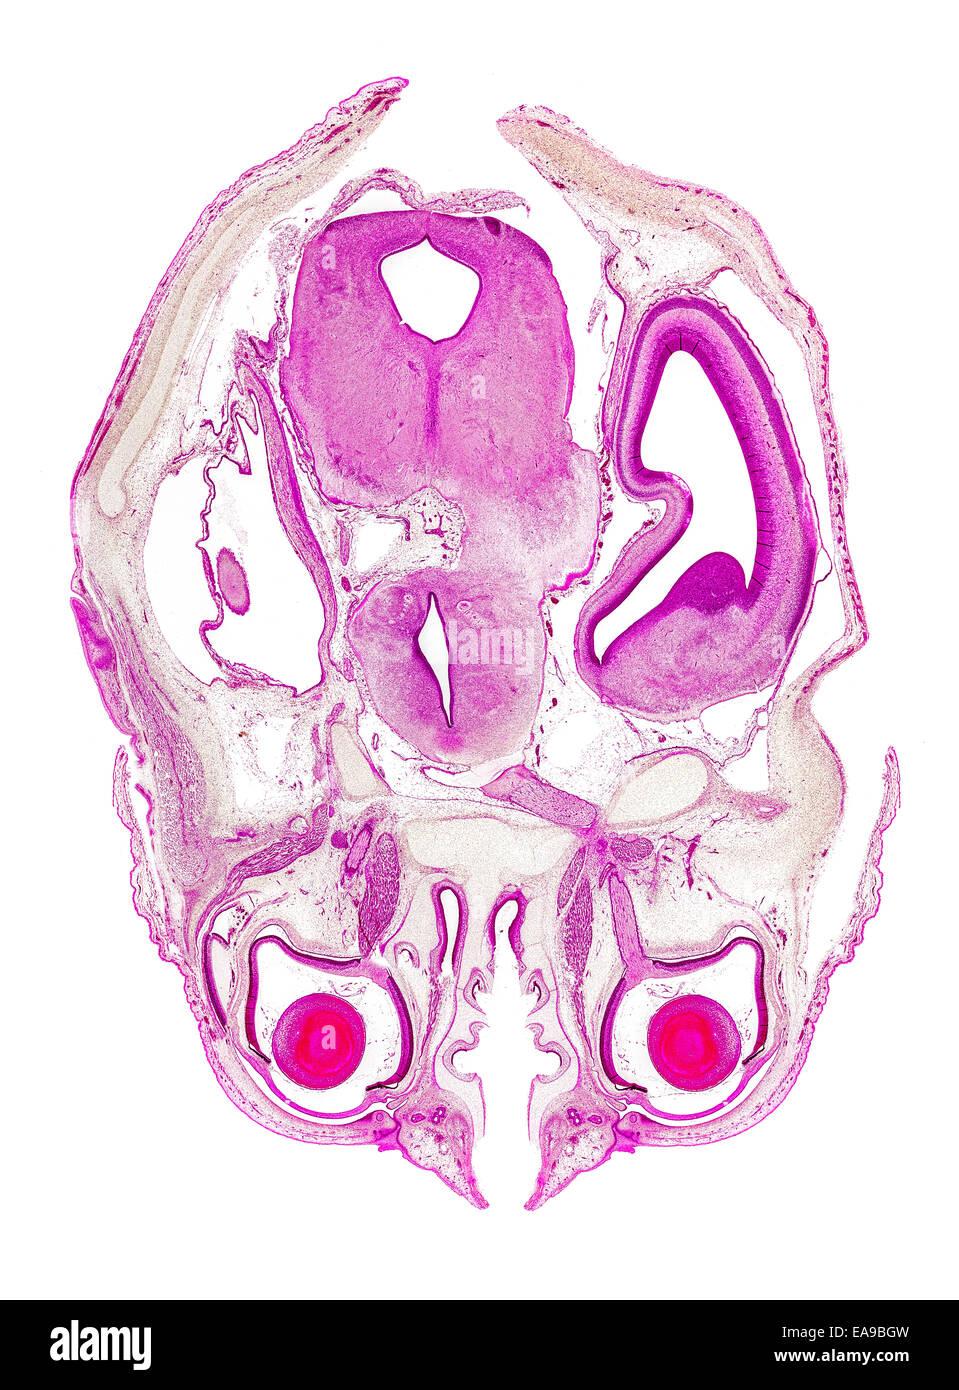 Feto humano sección manchada de cabeza mostrando estructura general Imagen De Stock